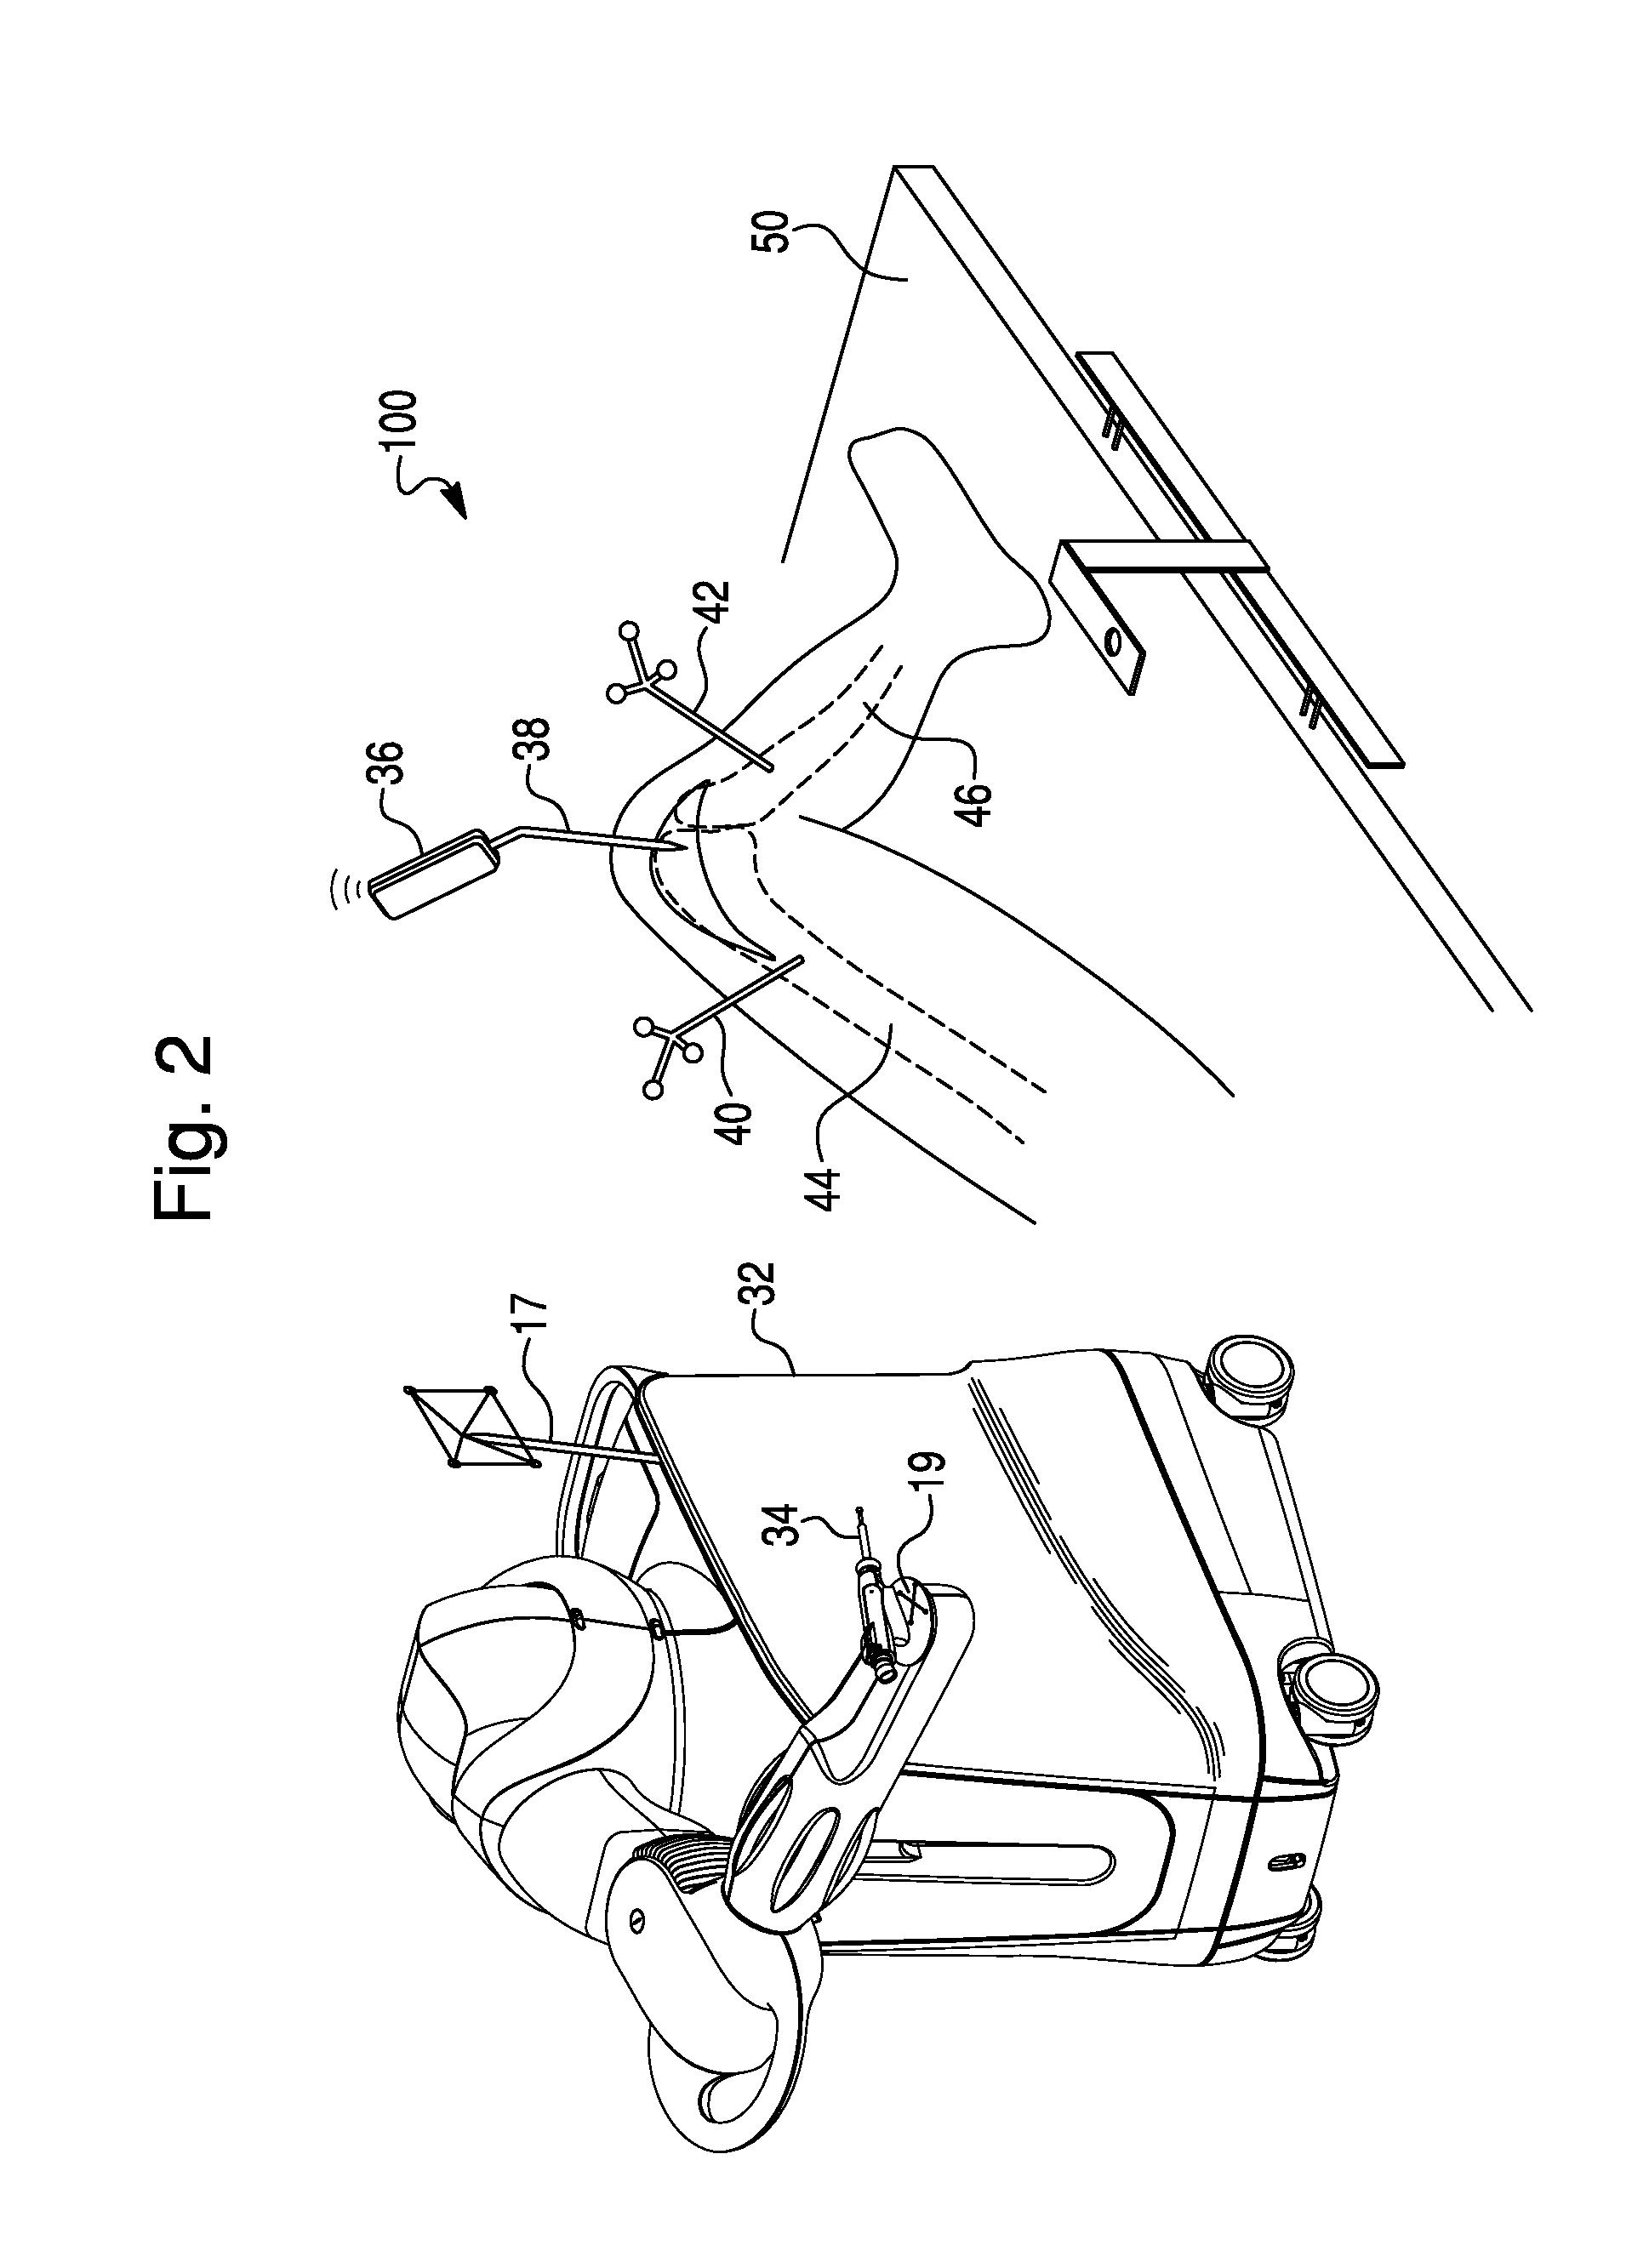 Dyna 2000i ignition wiring diagram in addition harley ignition wiring diagram with car furthermore ninja 250